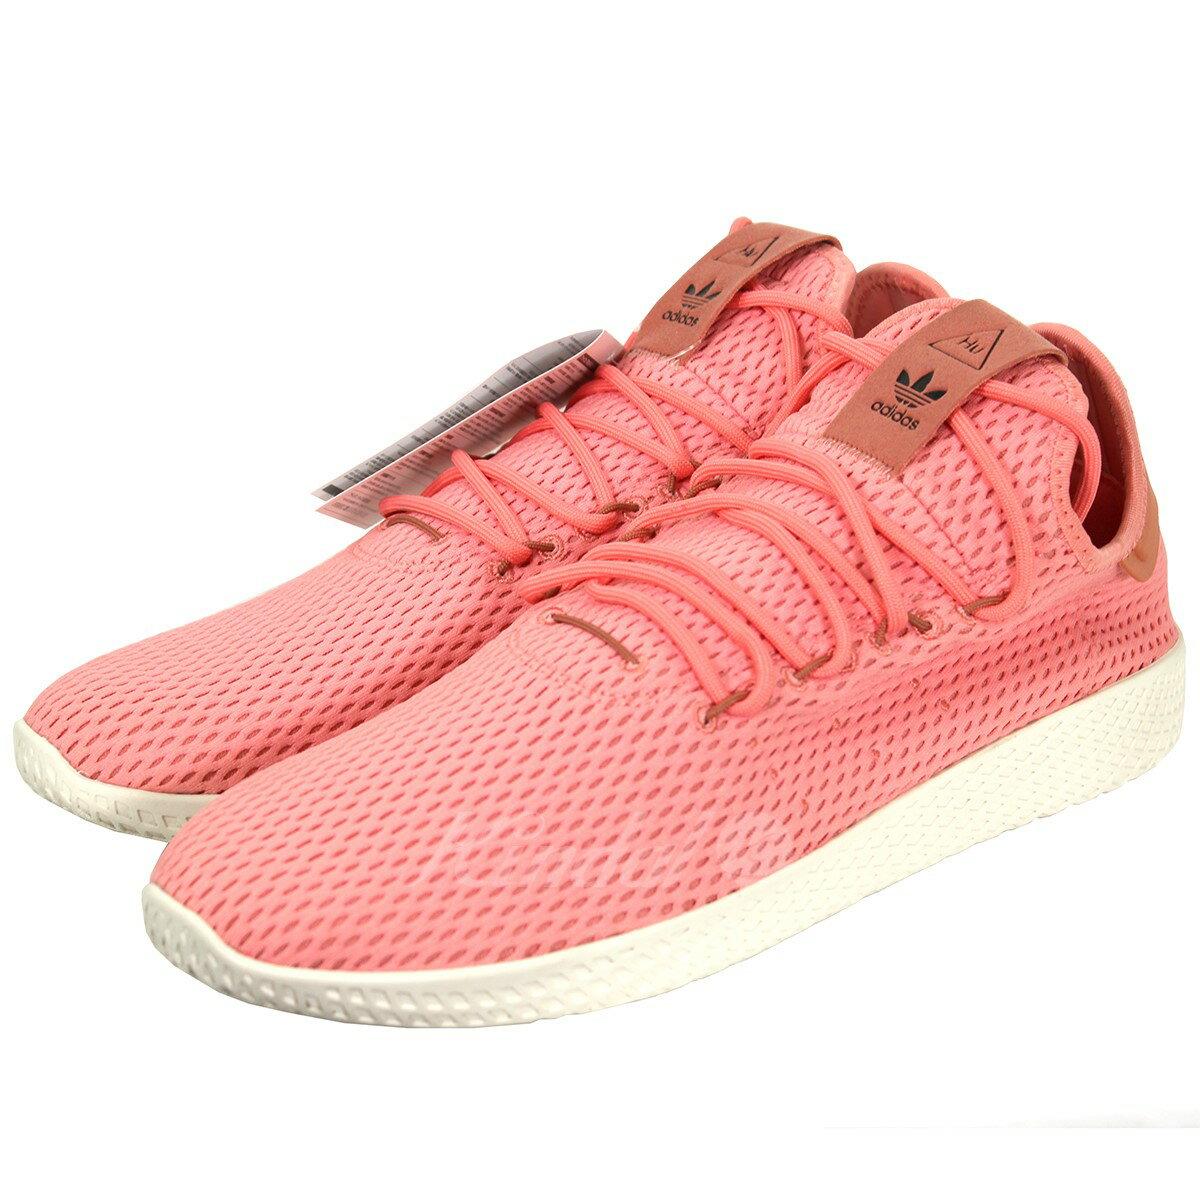 Originals Adidas Tennis Farrell Hu By8715 Pharrell Williams Pink Primeknit Size30cmadidas Williams Shoes 7bgf6y